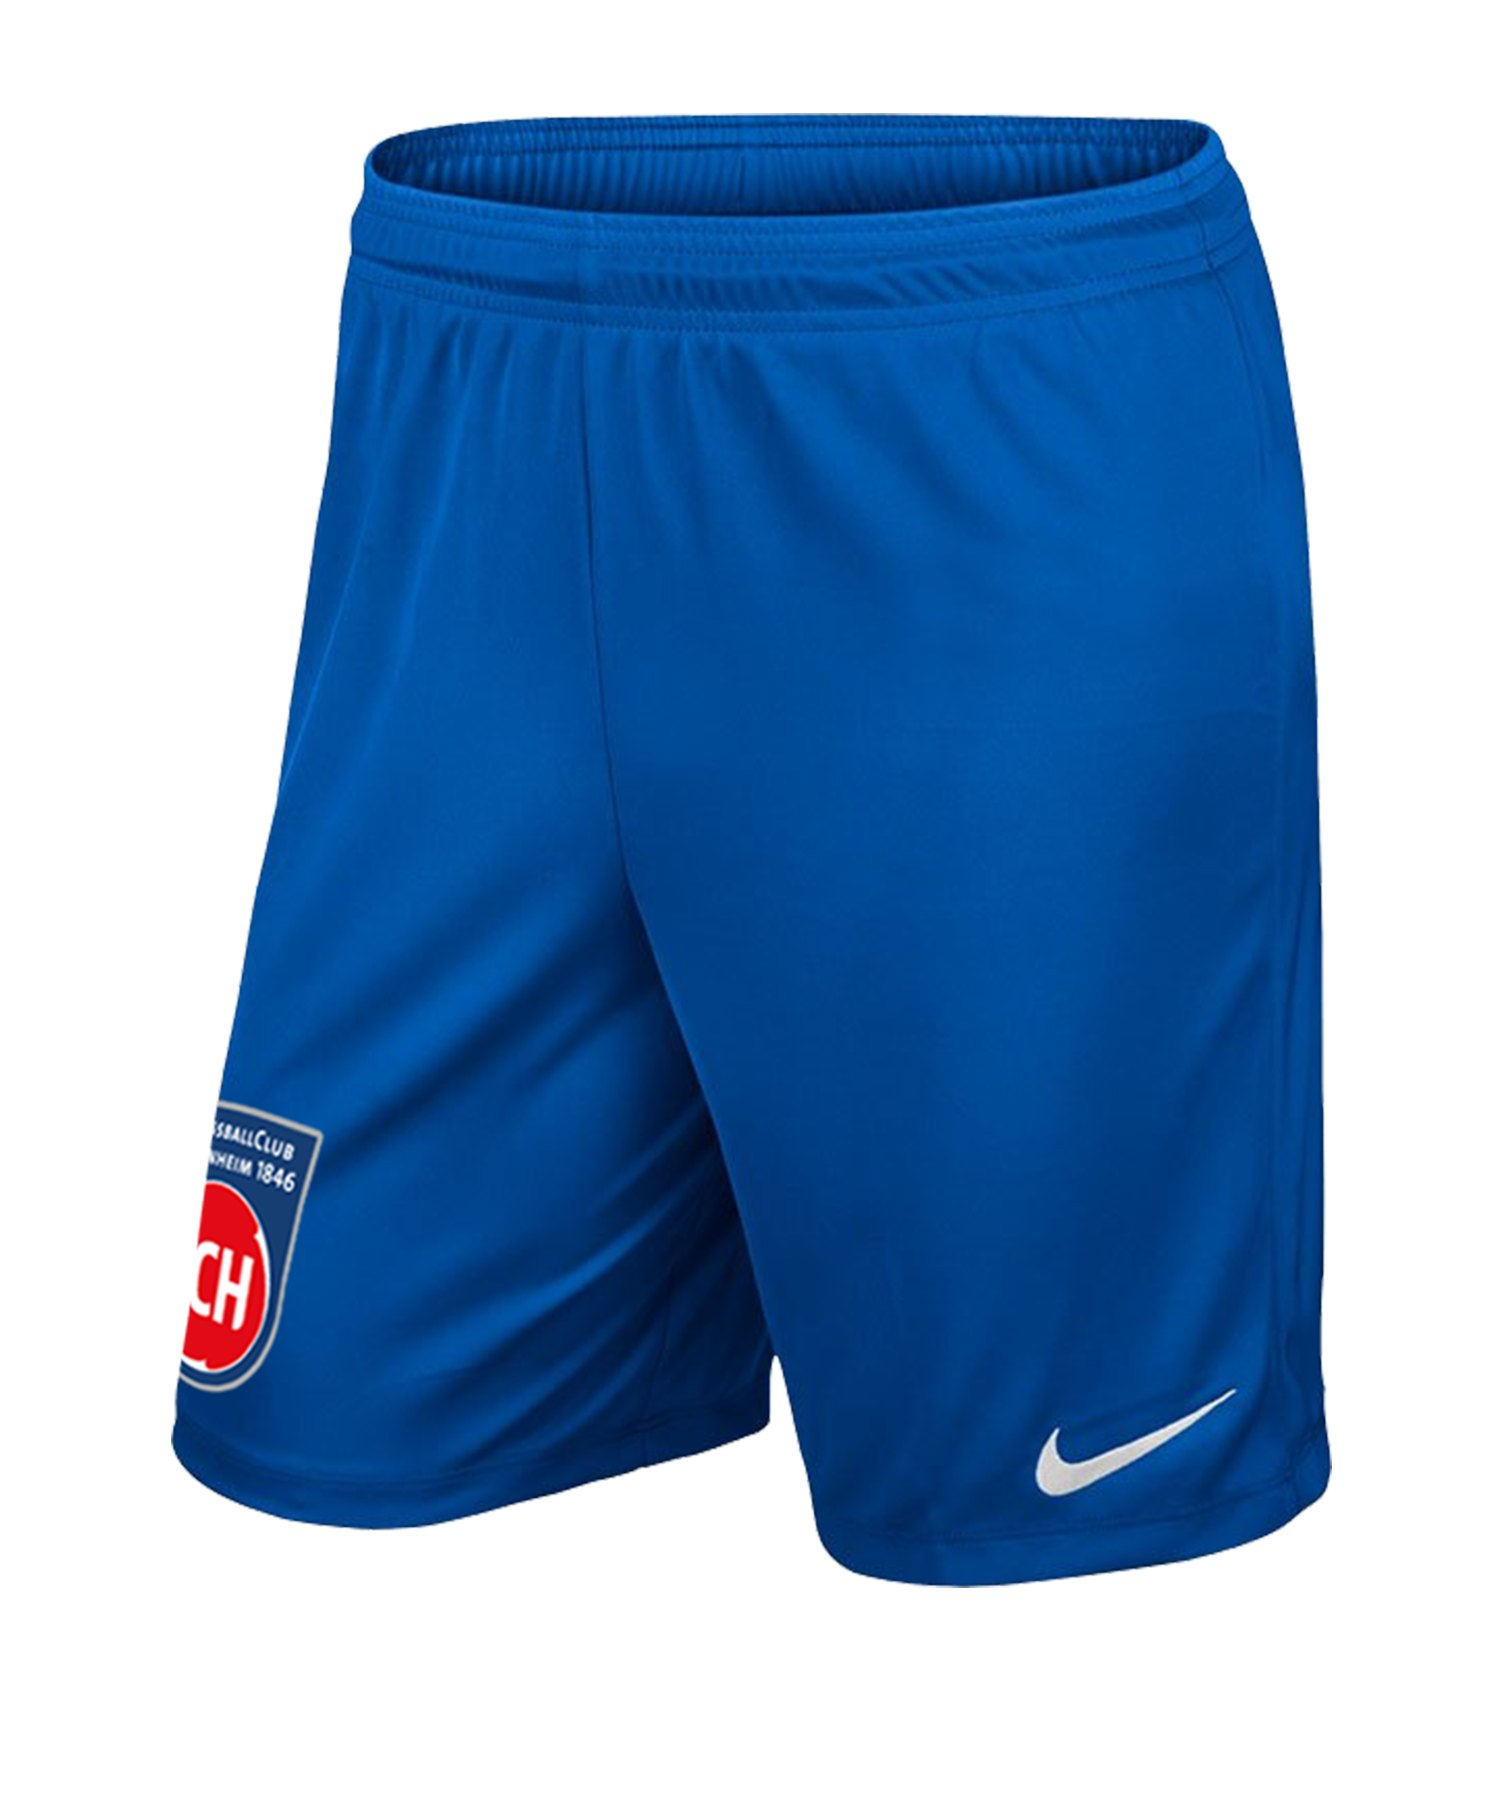 Nike 1. FC Heidenheim Short Away 2019/2020 F463 - blau